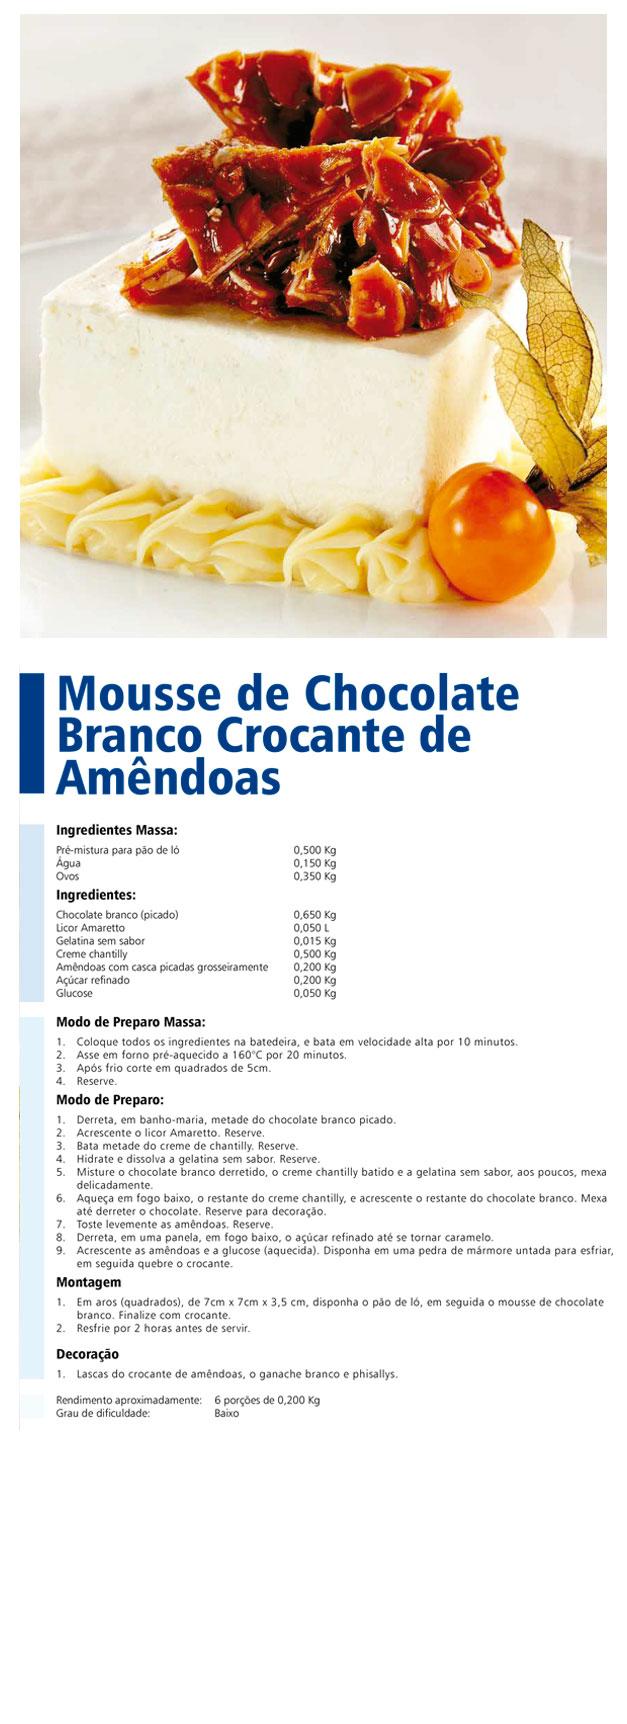 mousse-de-chocolate-branco-de-amendoas